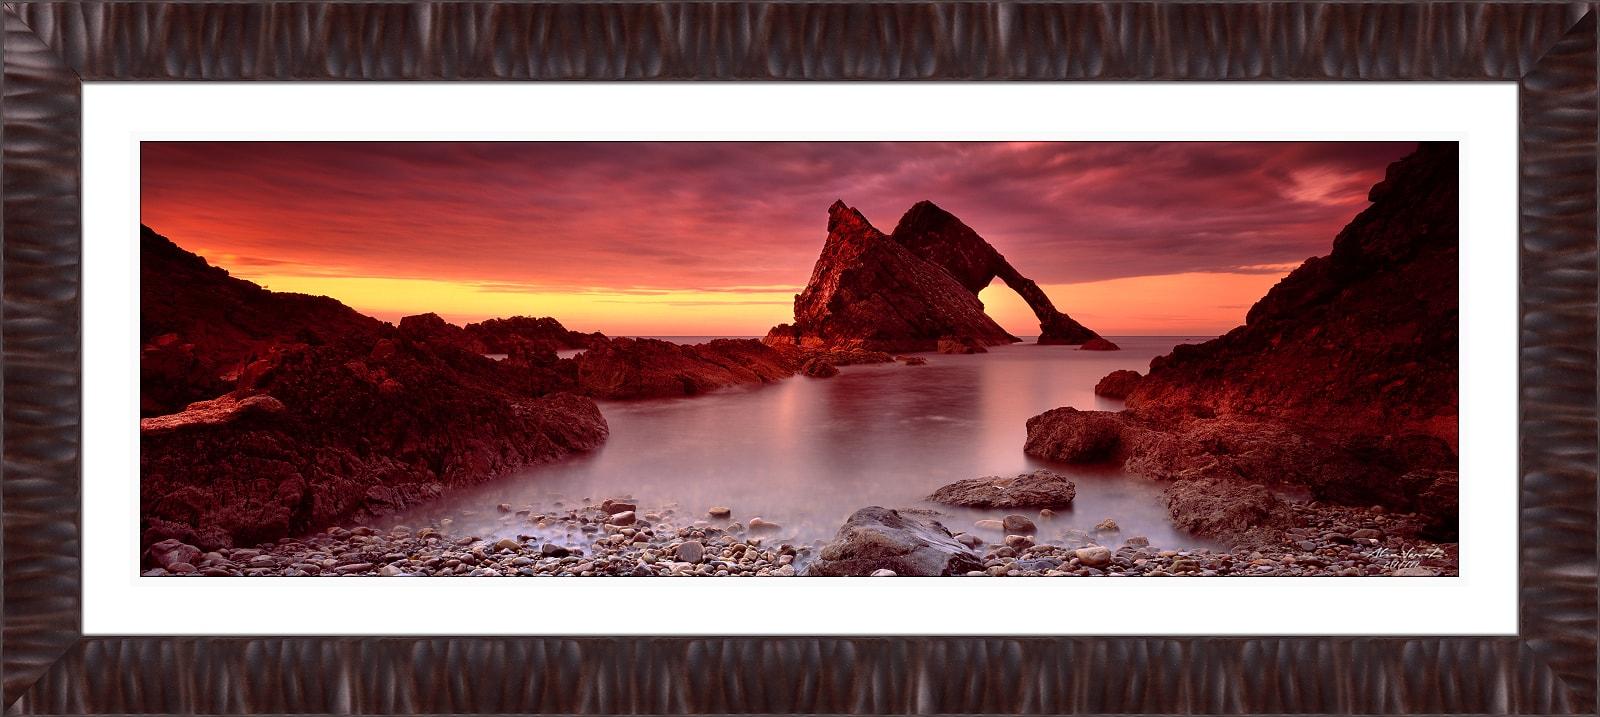 Landscape Photo Print Acrylled And Framed